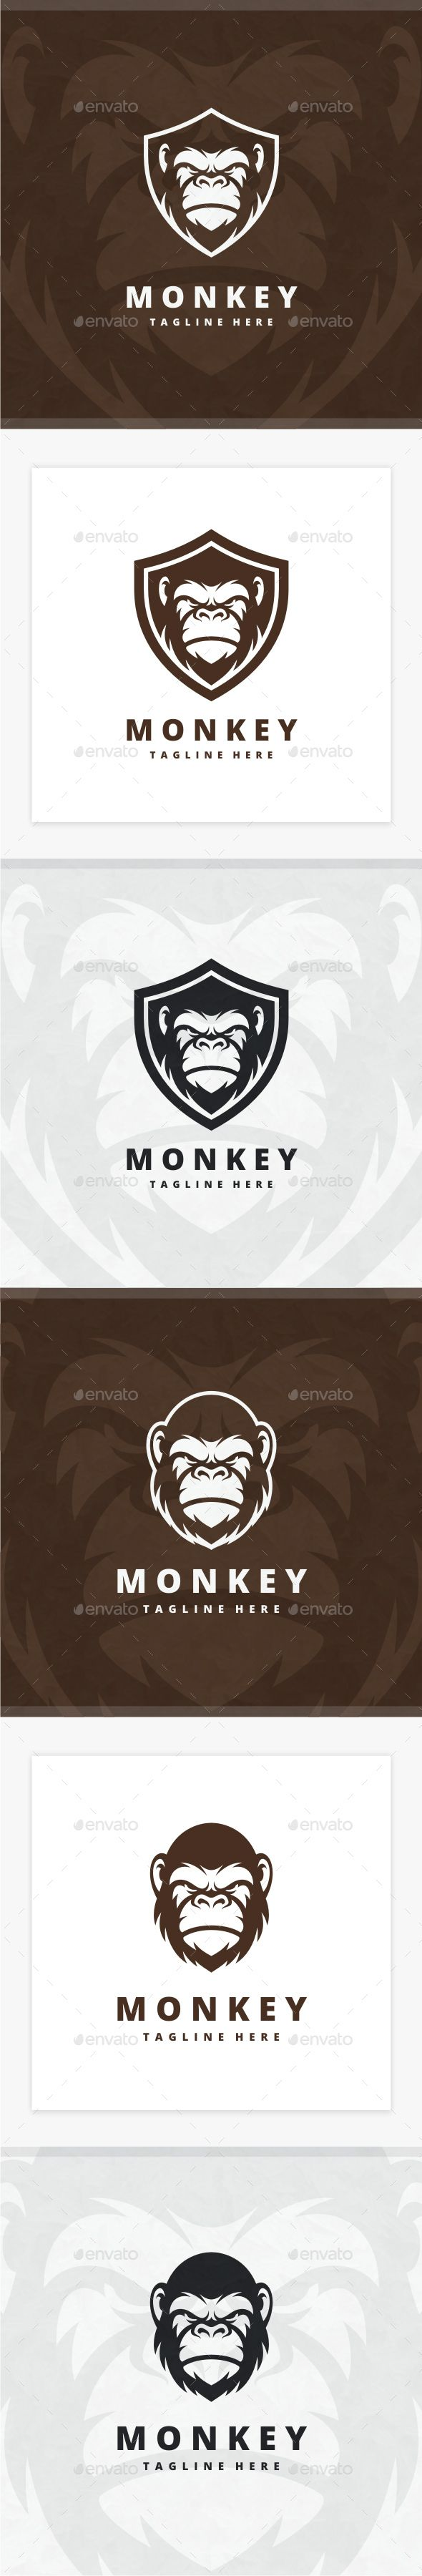 Monkey Logo - #Animals #Logo Templates Download here: https://graphicriver.net/item/monkey-logo/20388798?ref=alena994